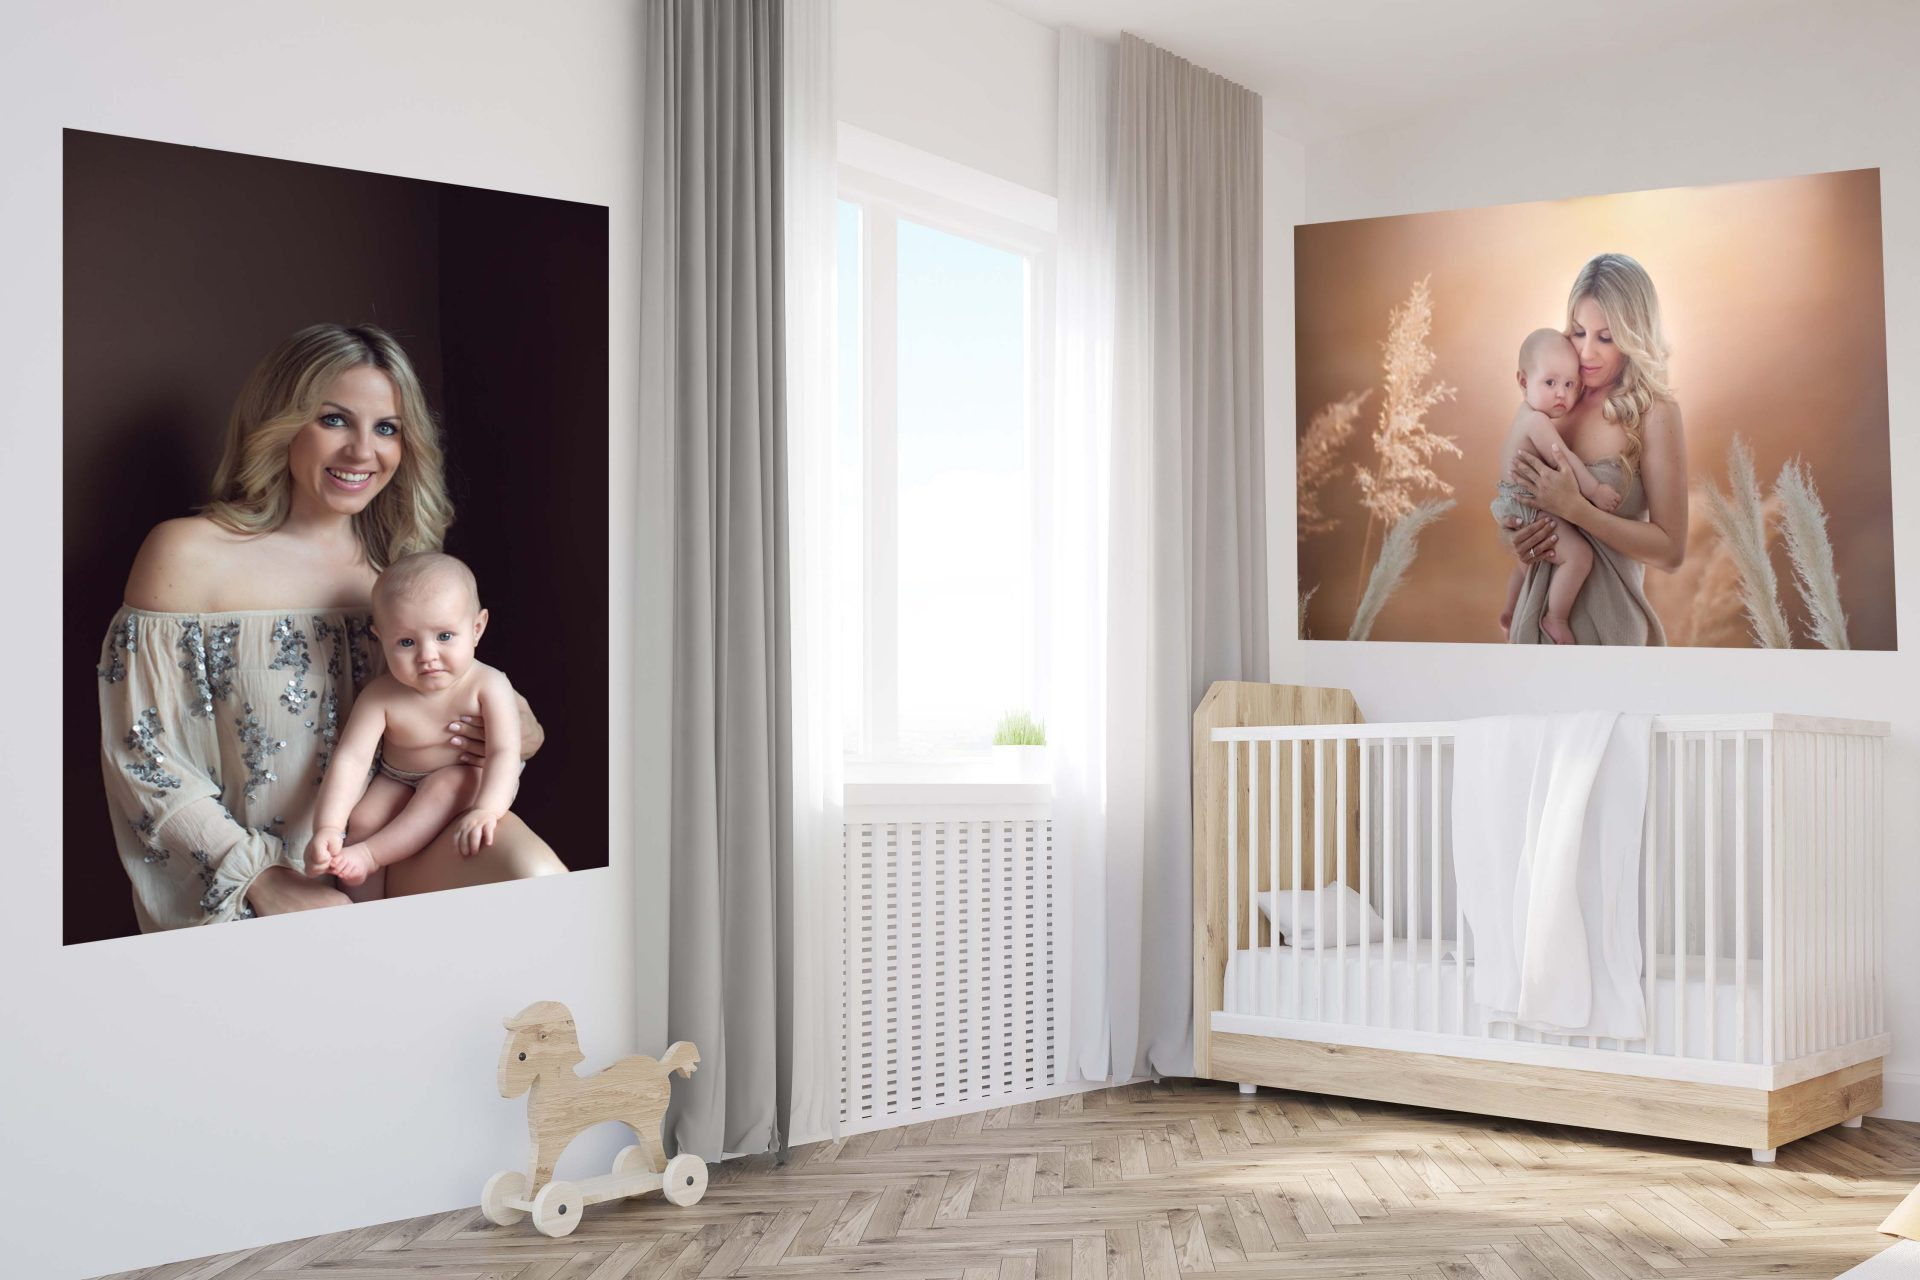 sesion-de-fotos-de-embarazo-beata-praska-fotografia